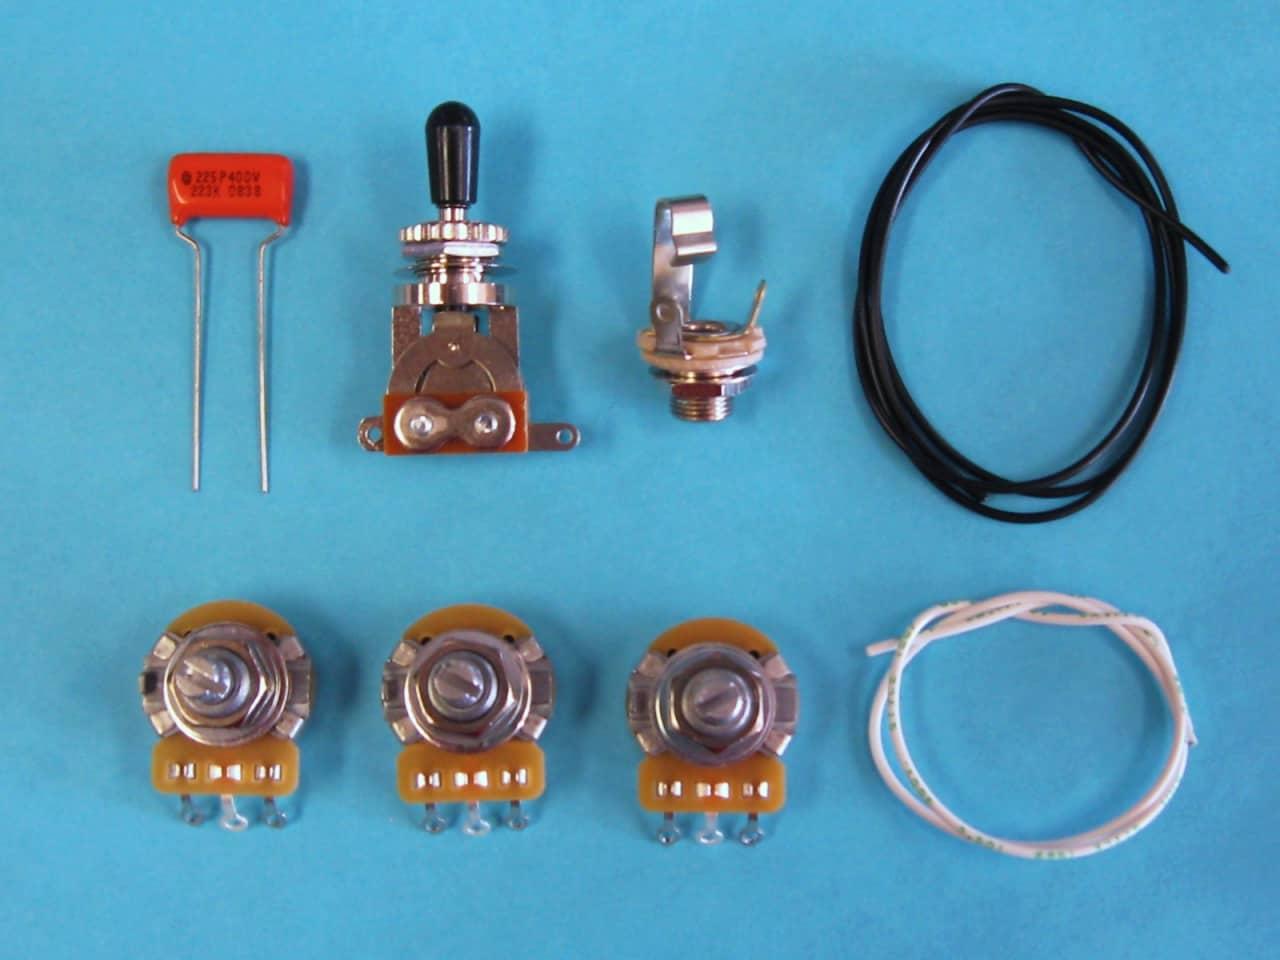 AM Guitar Works 2 Volume 1 Tone 1 Toggle Guitar Wiring Kit | Reverb